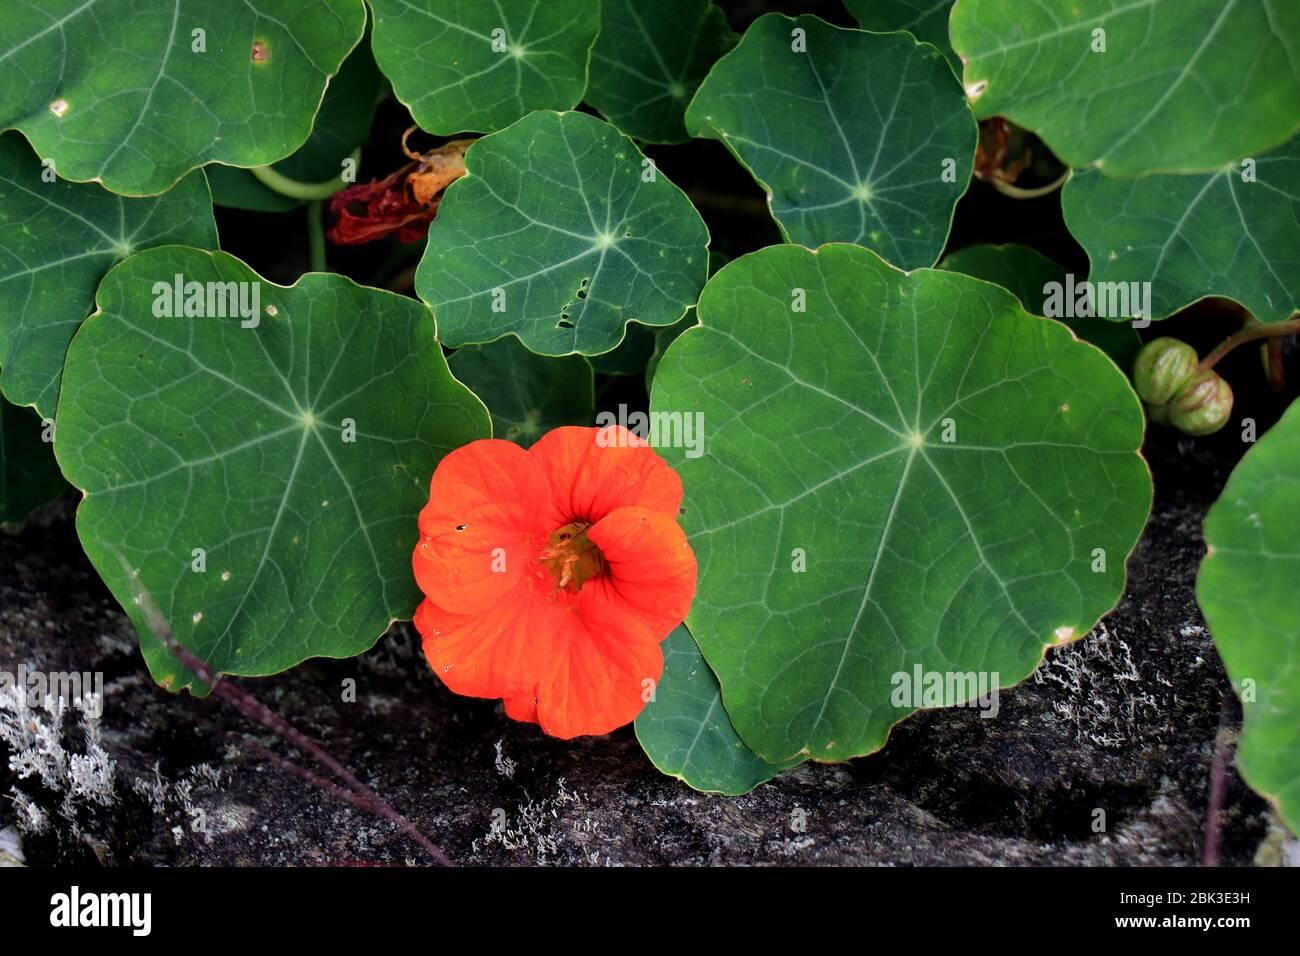 Nasturtium flowers. Tropaeolum majus garden nasturtium, Indian cress, or monks cress is a species of flowering plant in the family Tropaeolaceae. Stock Photo